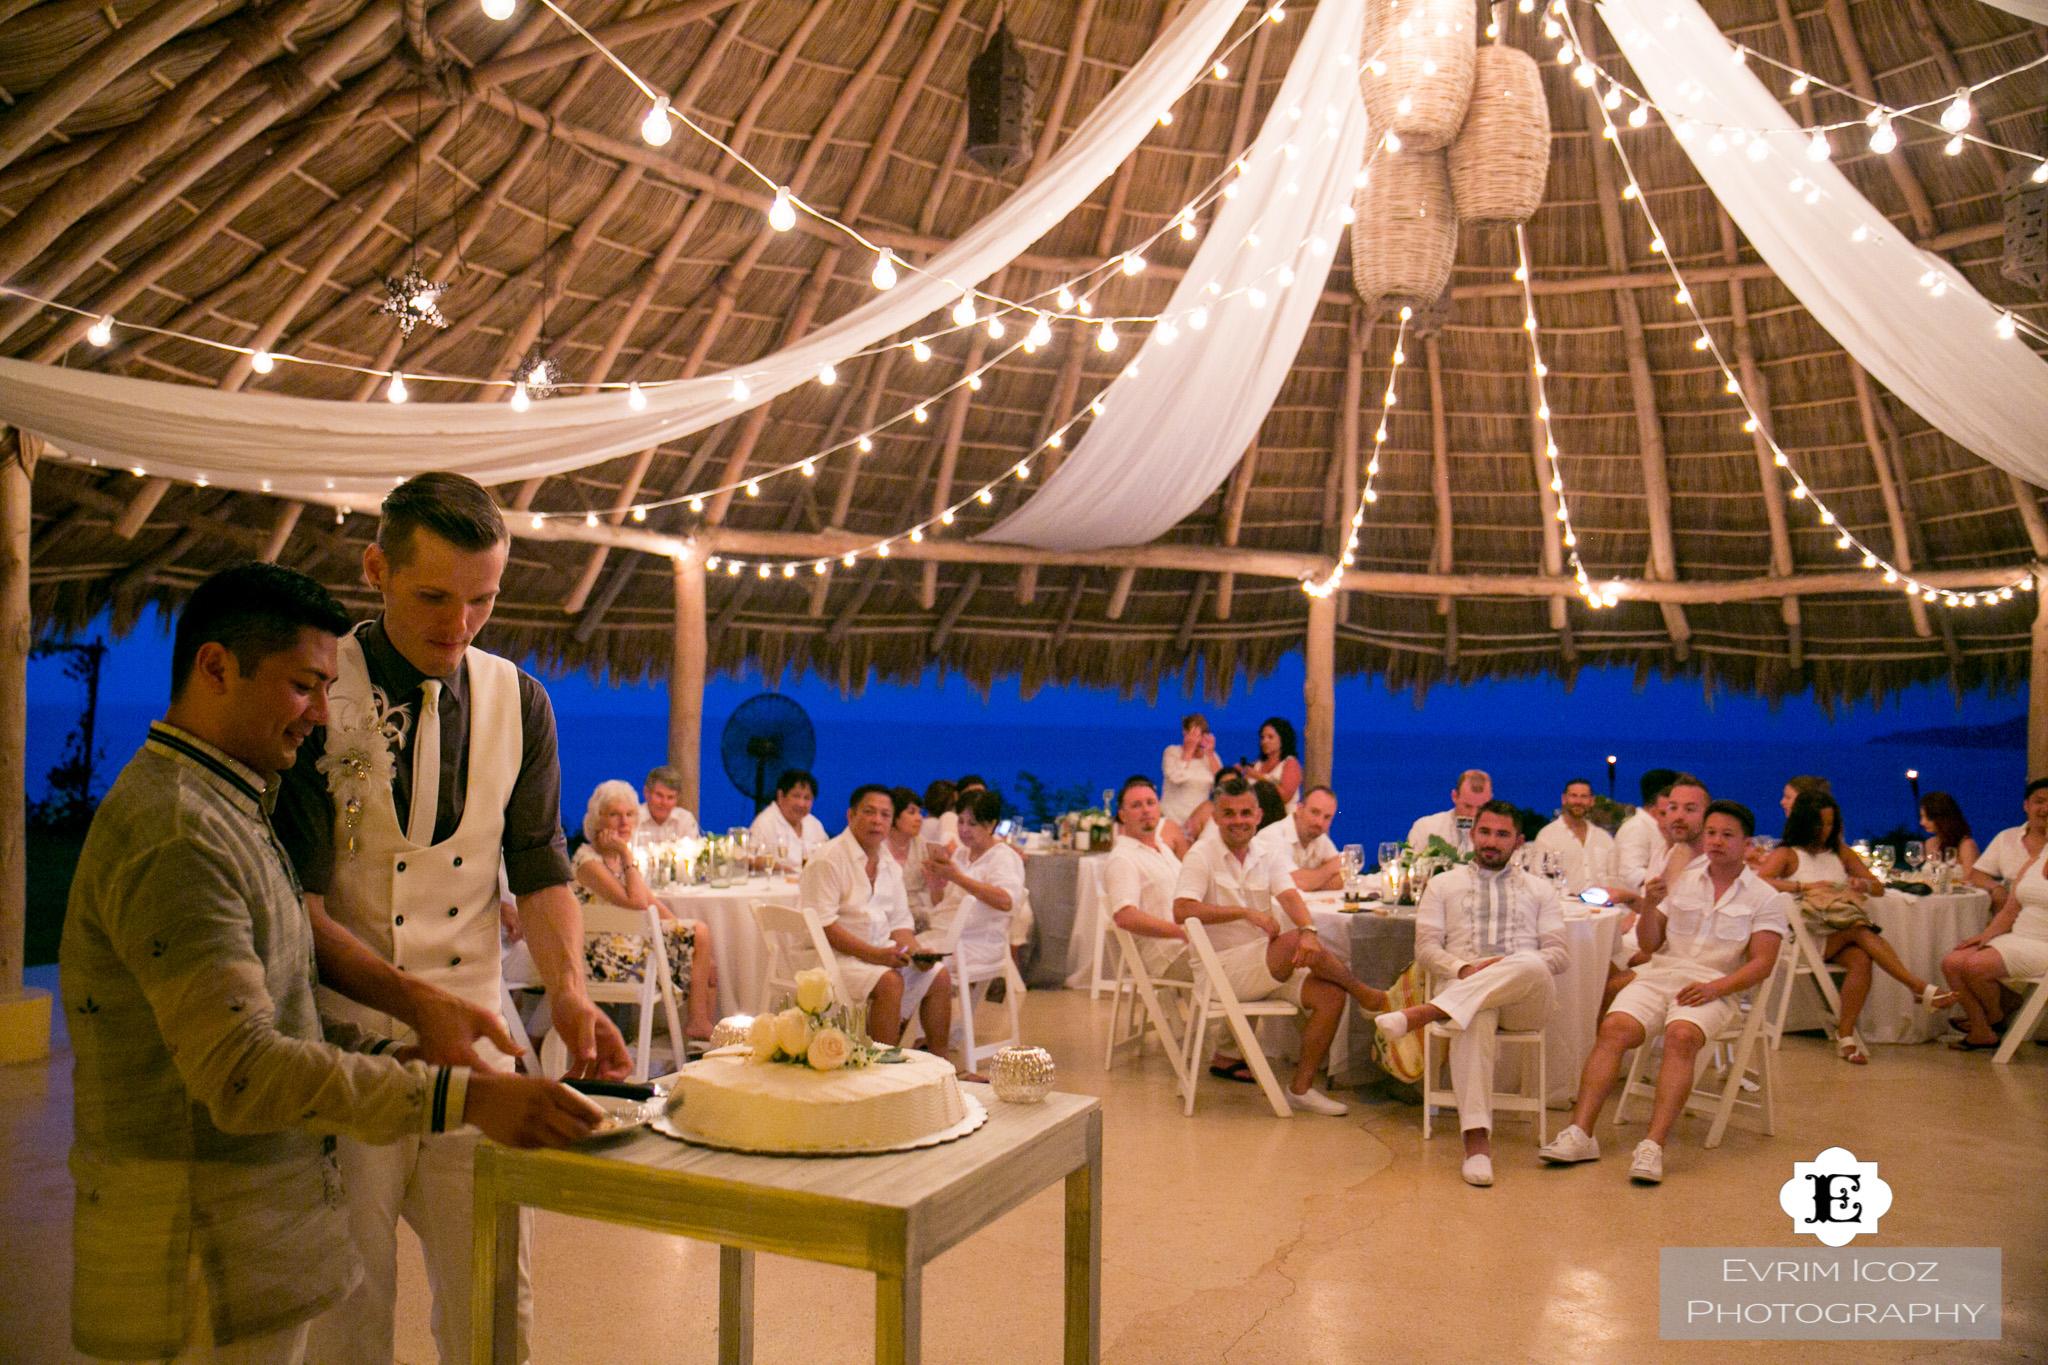 Jefferson + Patrick Wedding July 3 2016 - 7 of 10